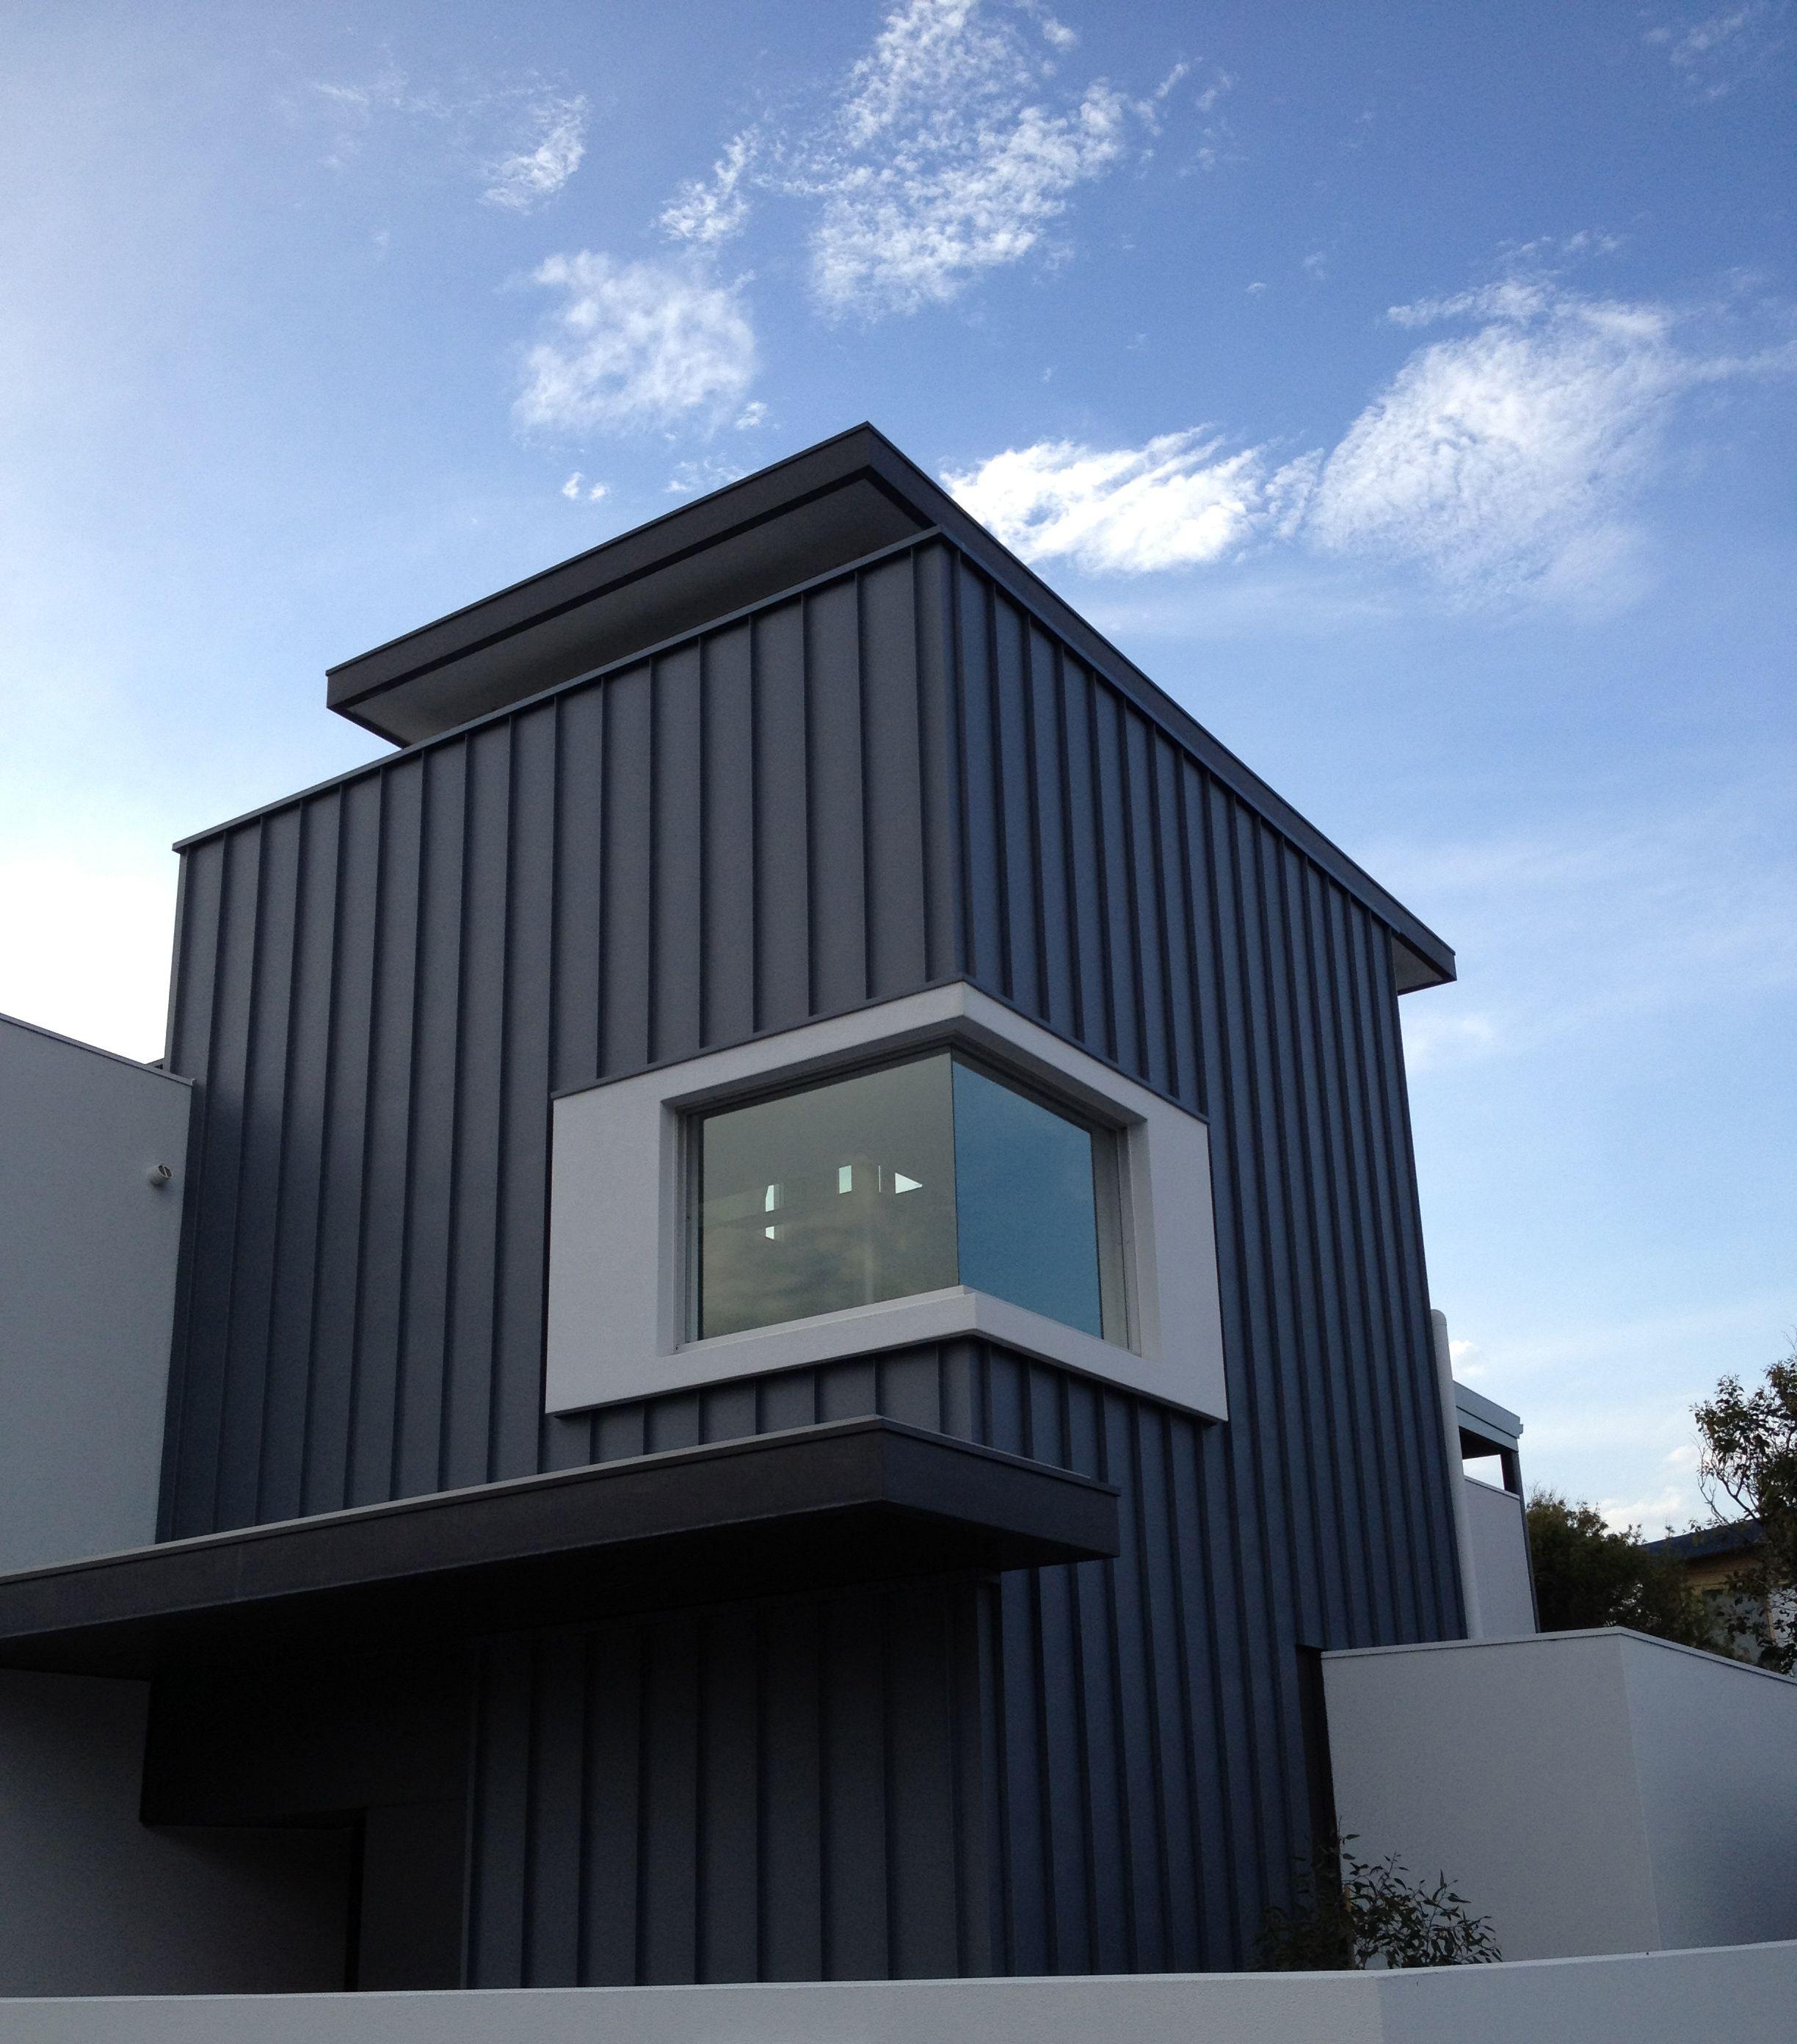 Metal Cladding Systems On The Bonbeach Build Metal Cladding House Cladding Facade House